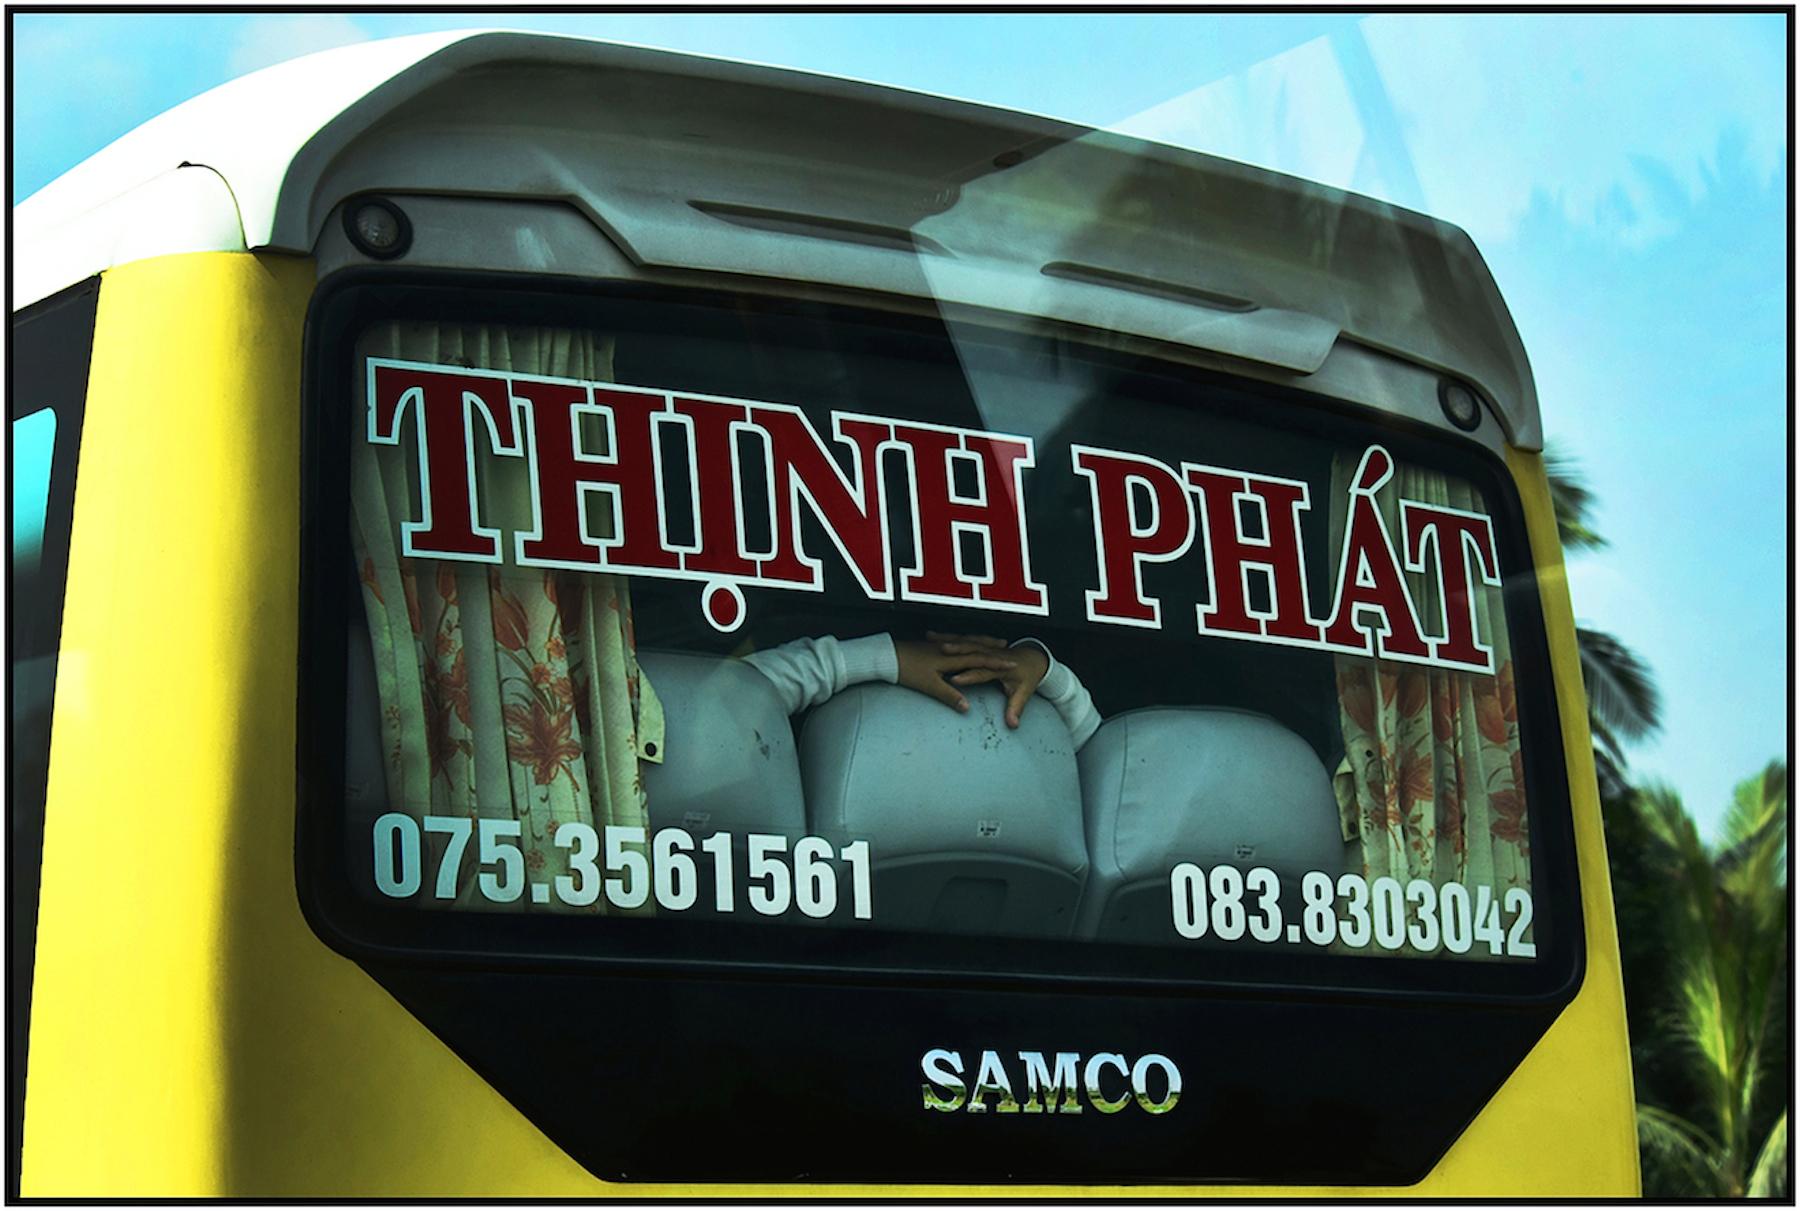 Thinh Phat (Thin Fat) Saigon/HCMC, Dec. 2015. #8172